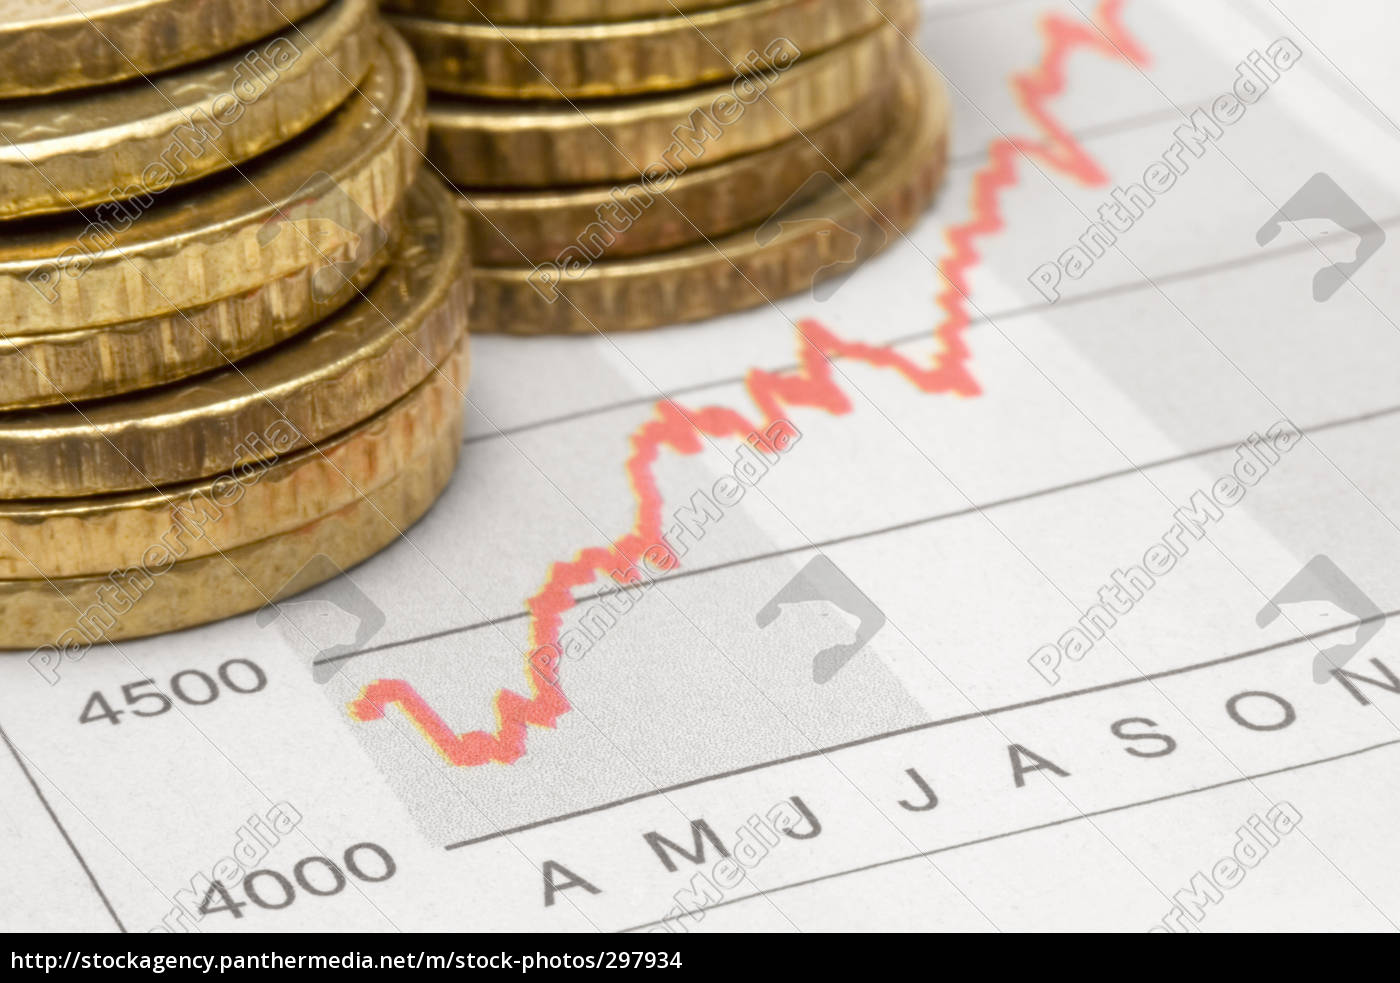 foreign, exchange, market - 297934